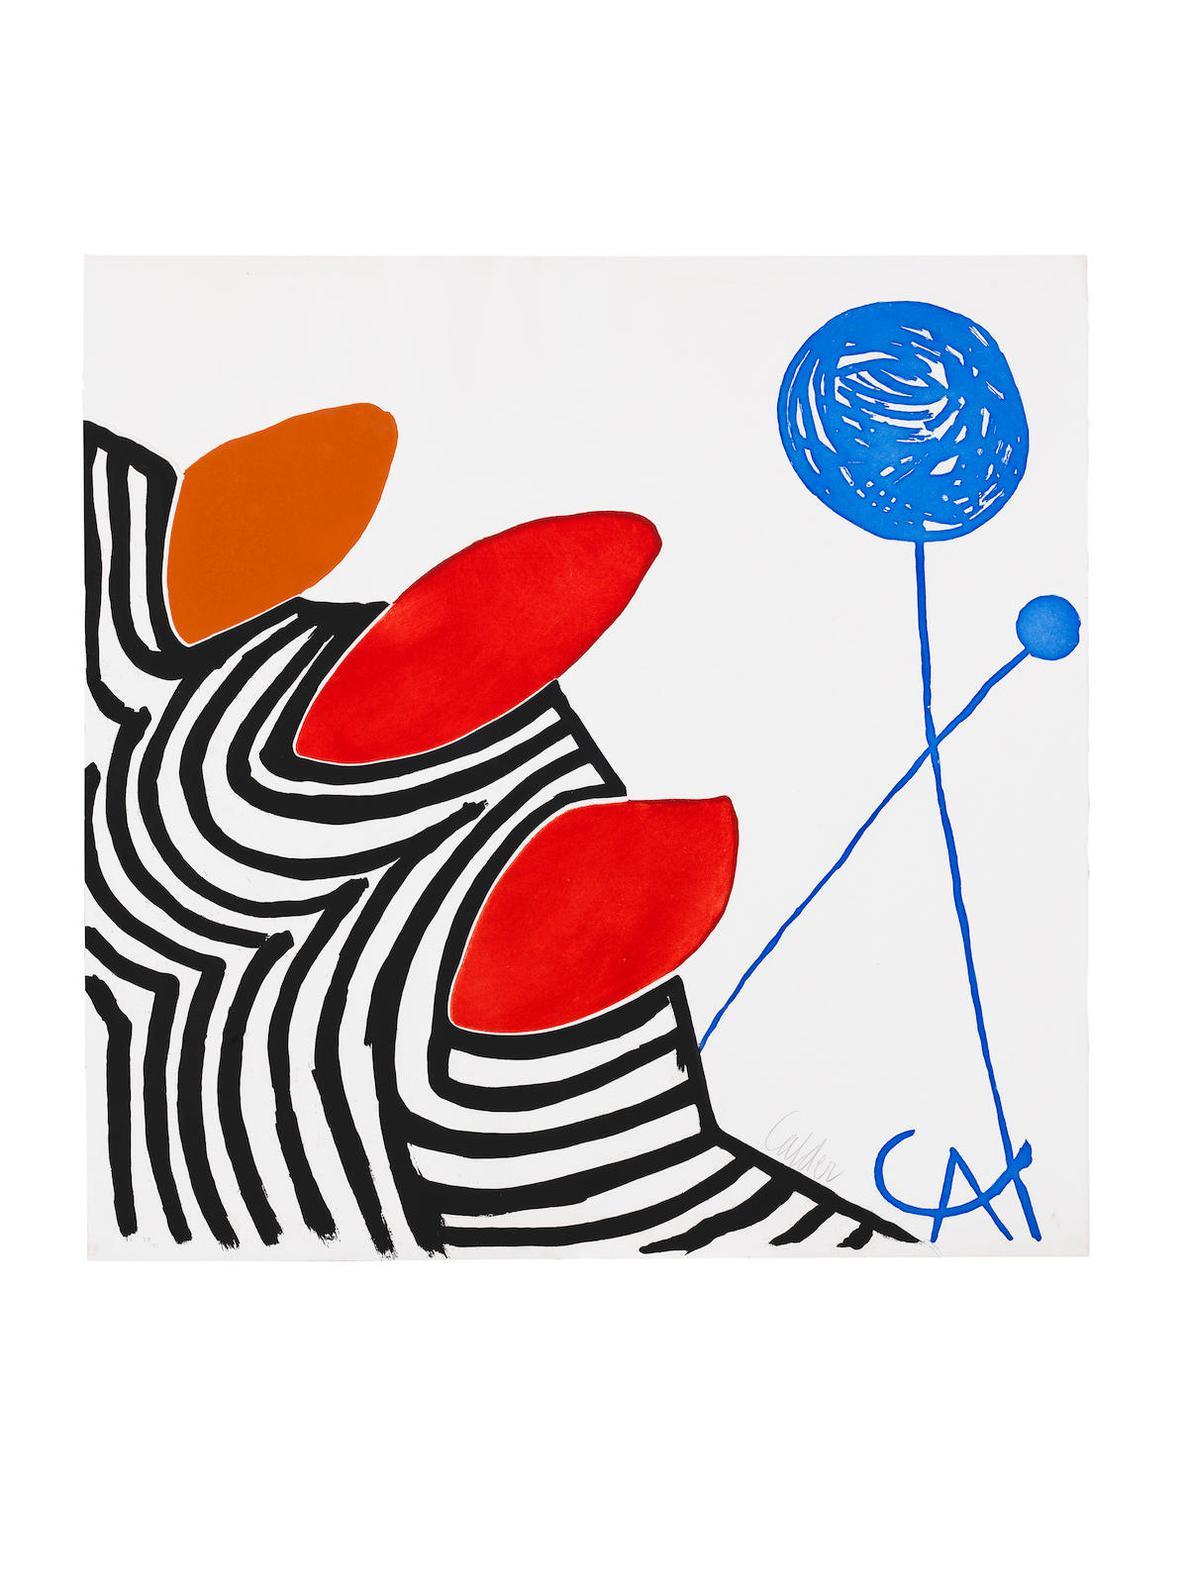 Alexander Calder-Presenza Grafica-1972